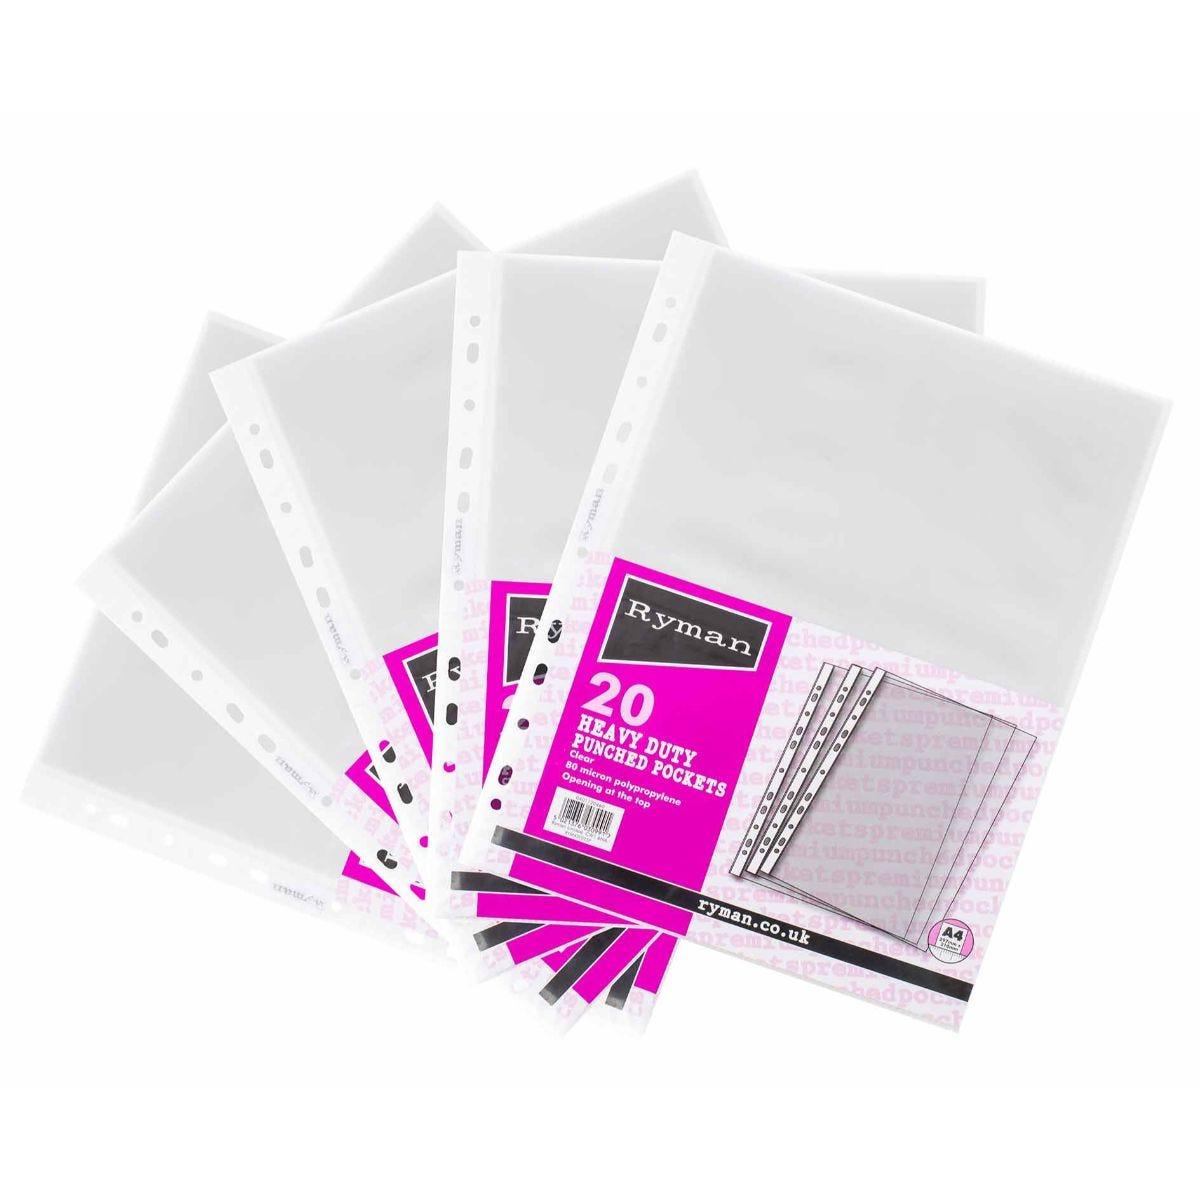 Ryman Premium Pockets 80mic A4 Pack of 100 Clear